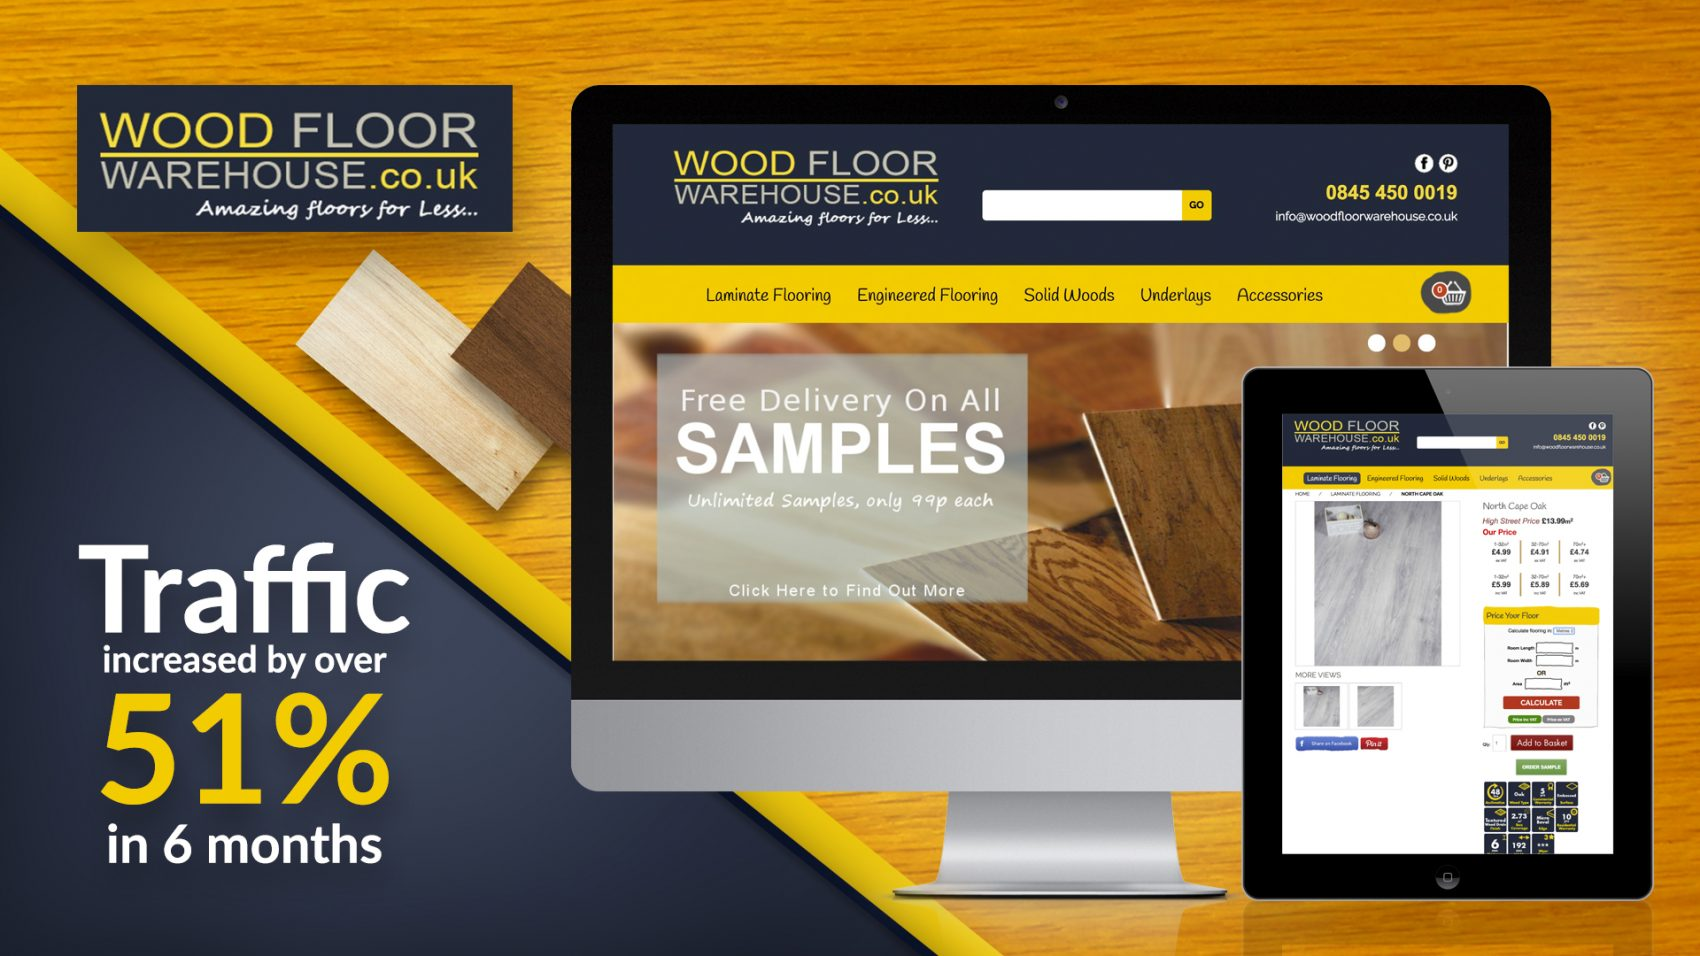 woodfloor warehouse seo dublin results